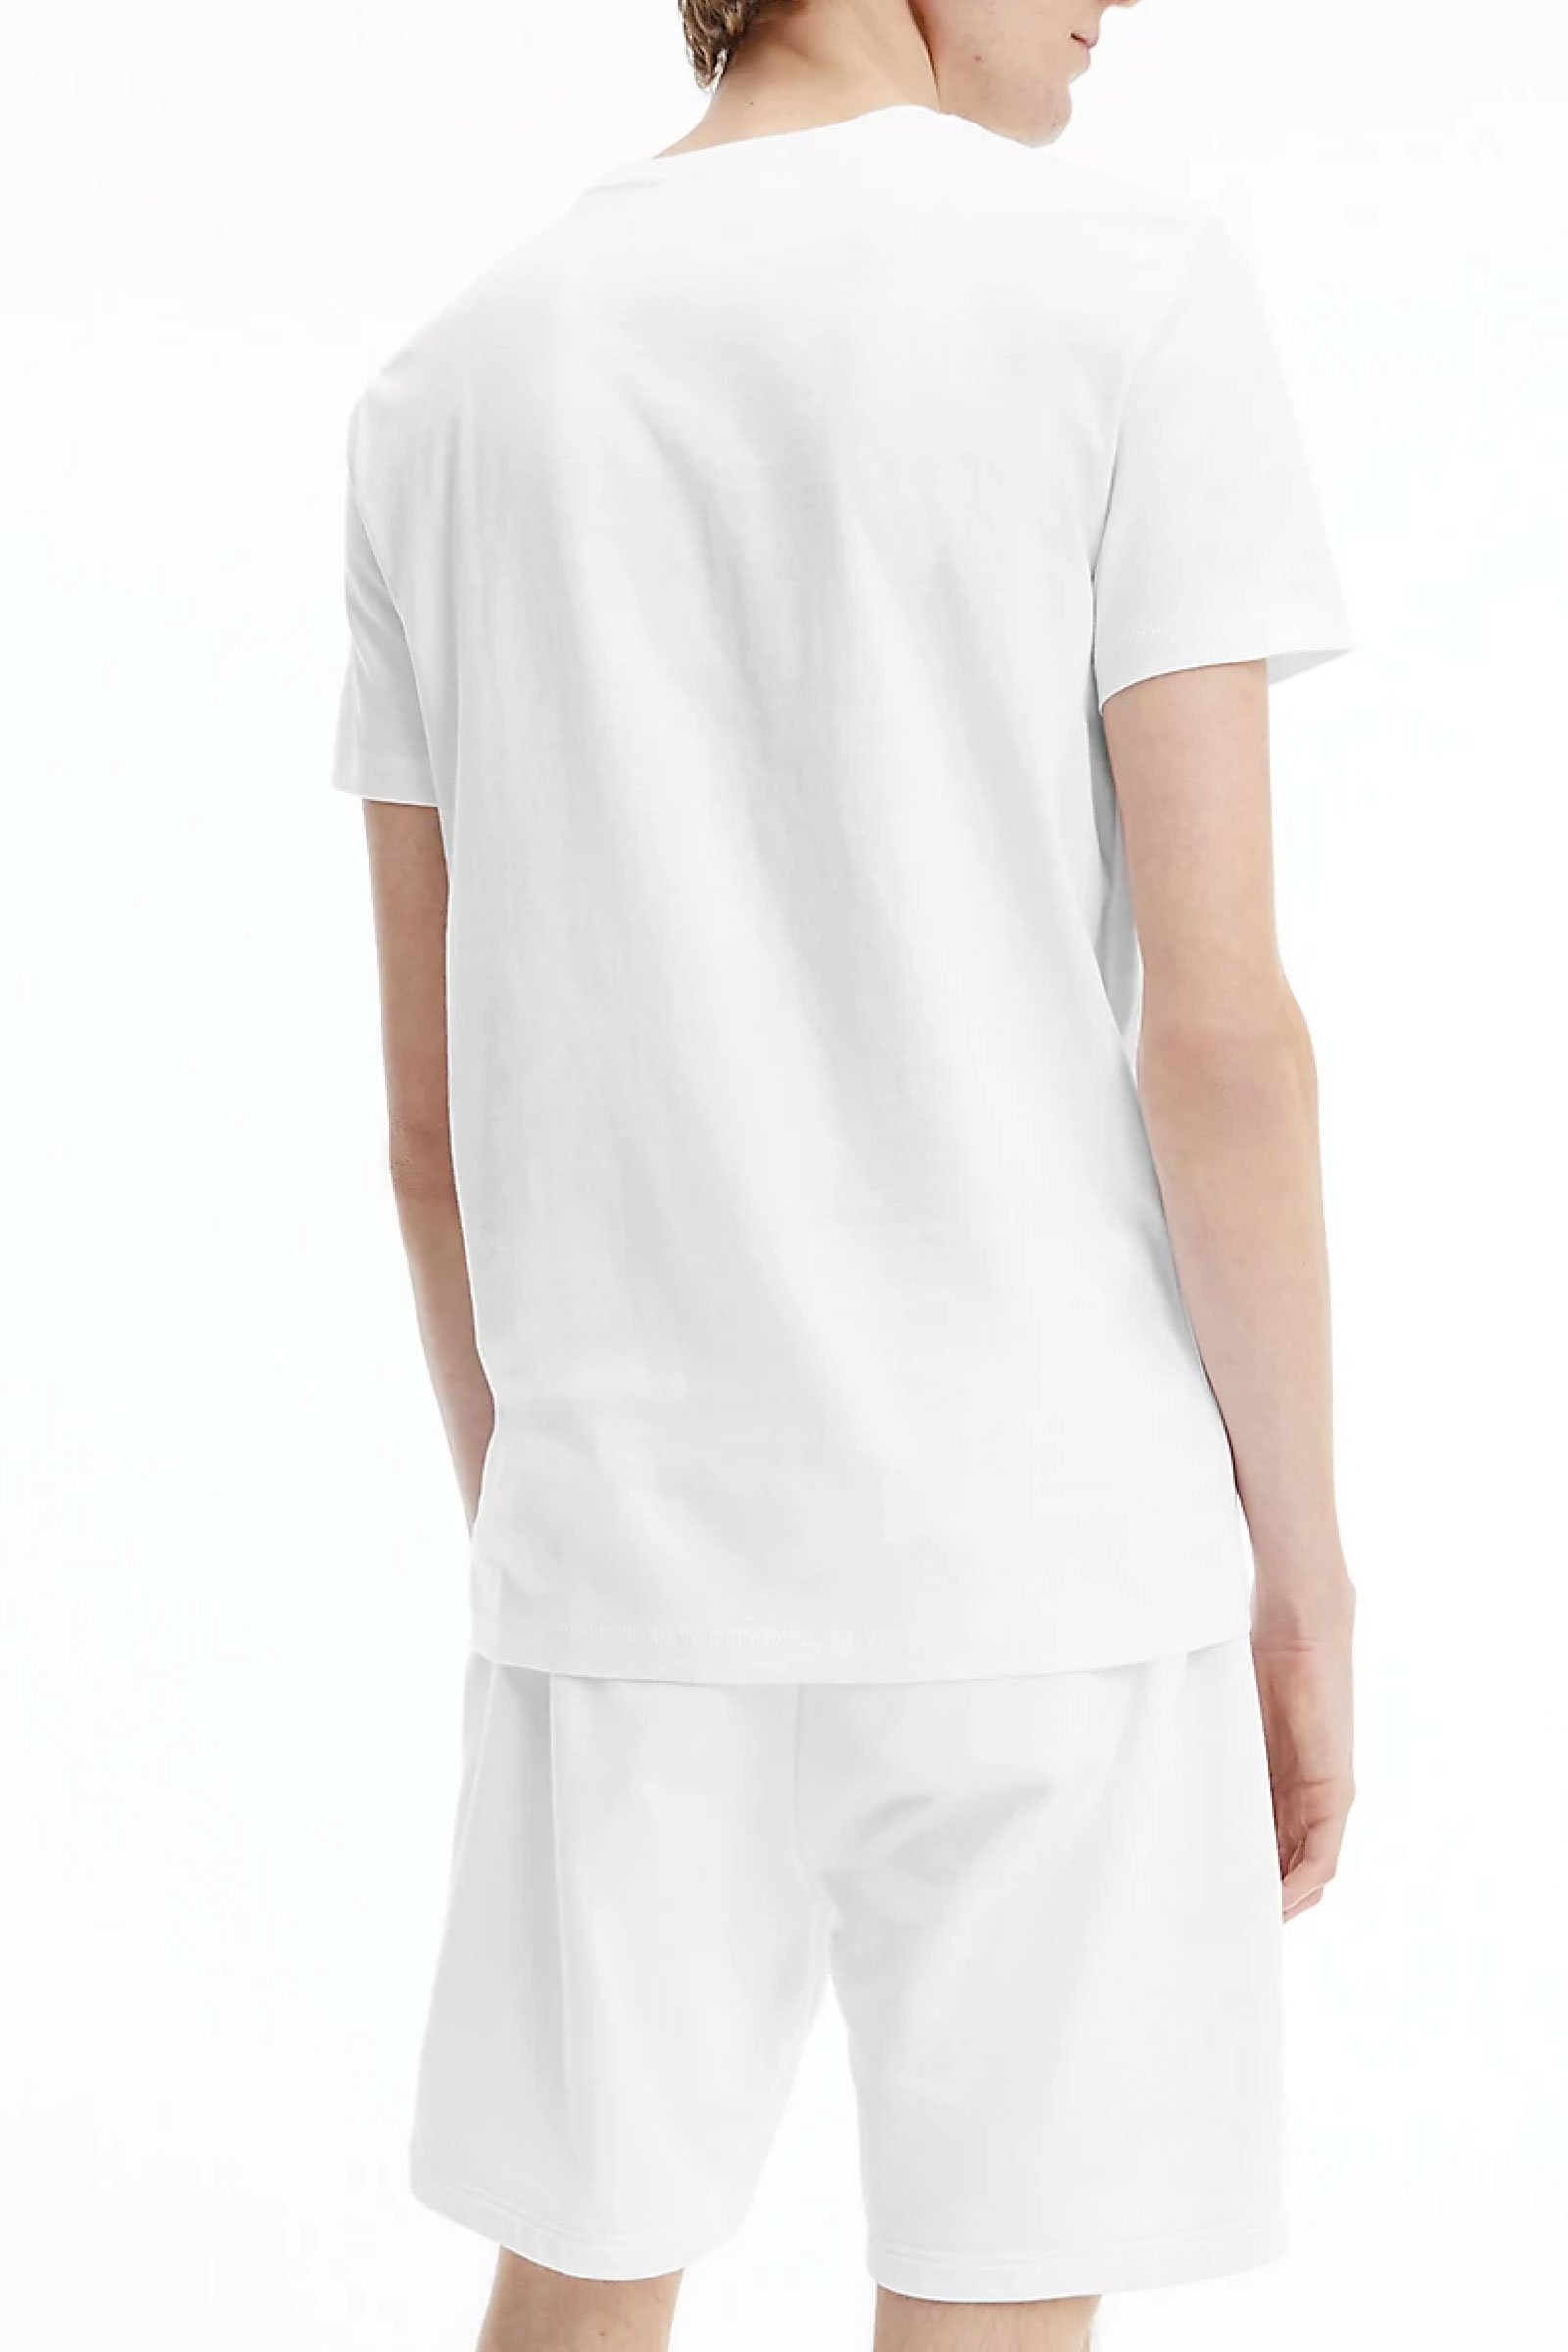 CALVIN KLEIN JEANS Men's T-Shirt CALVIN KLEIN JEANS   T-Shirt   J30J317065YAF